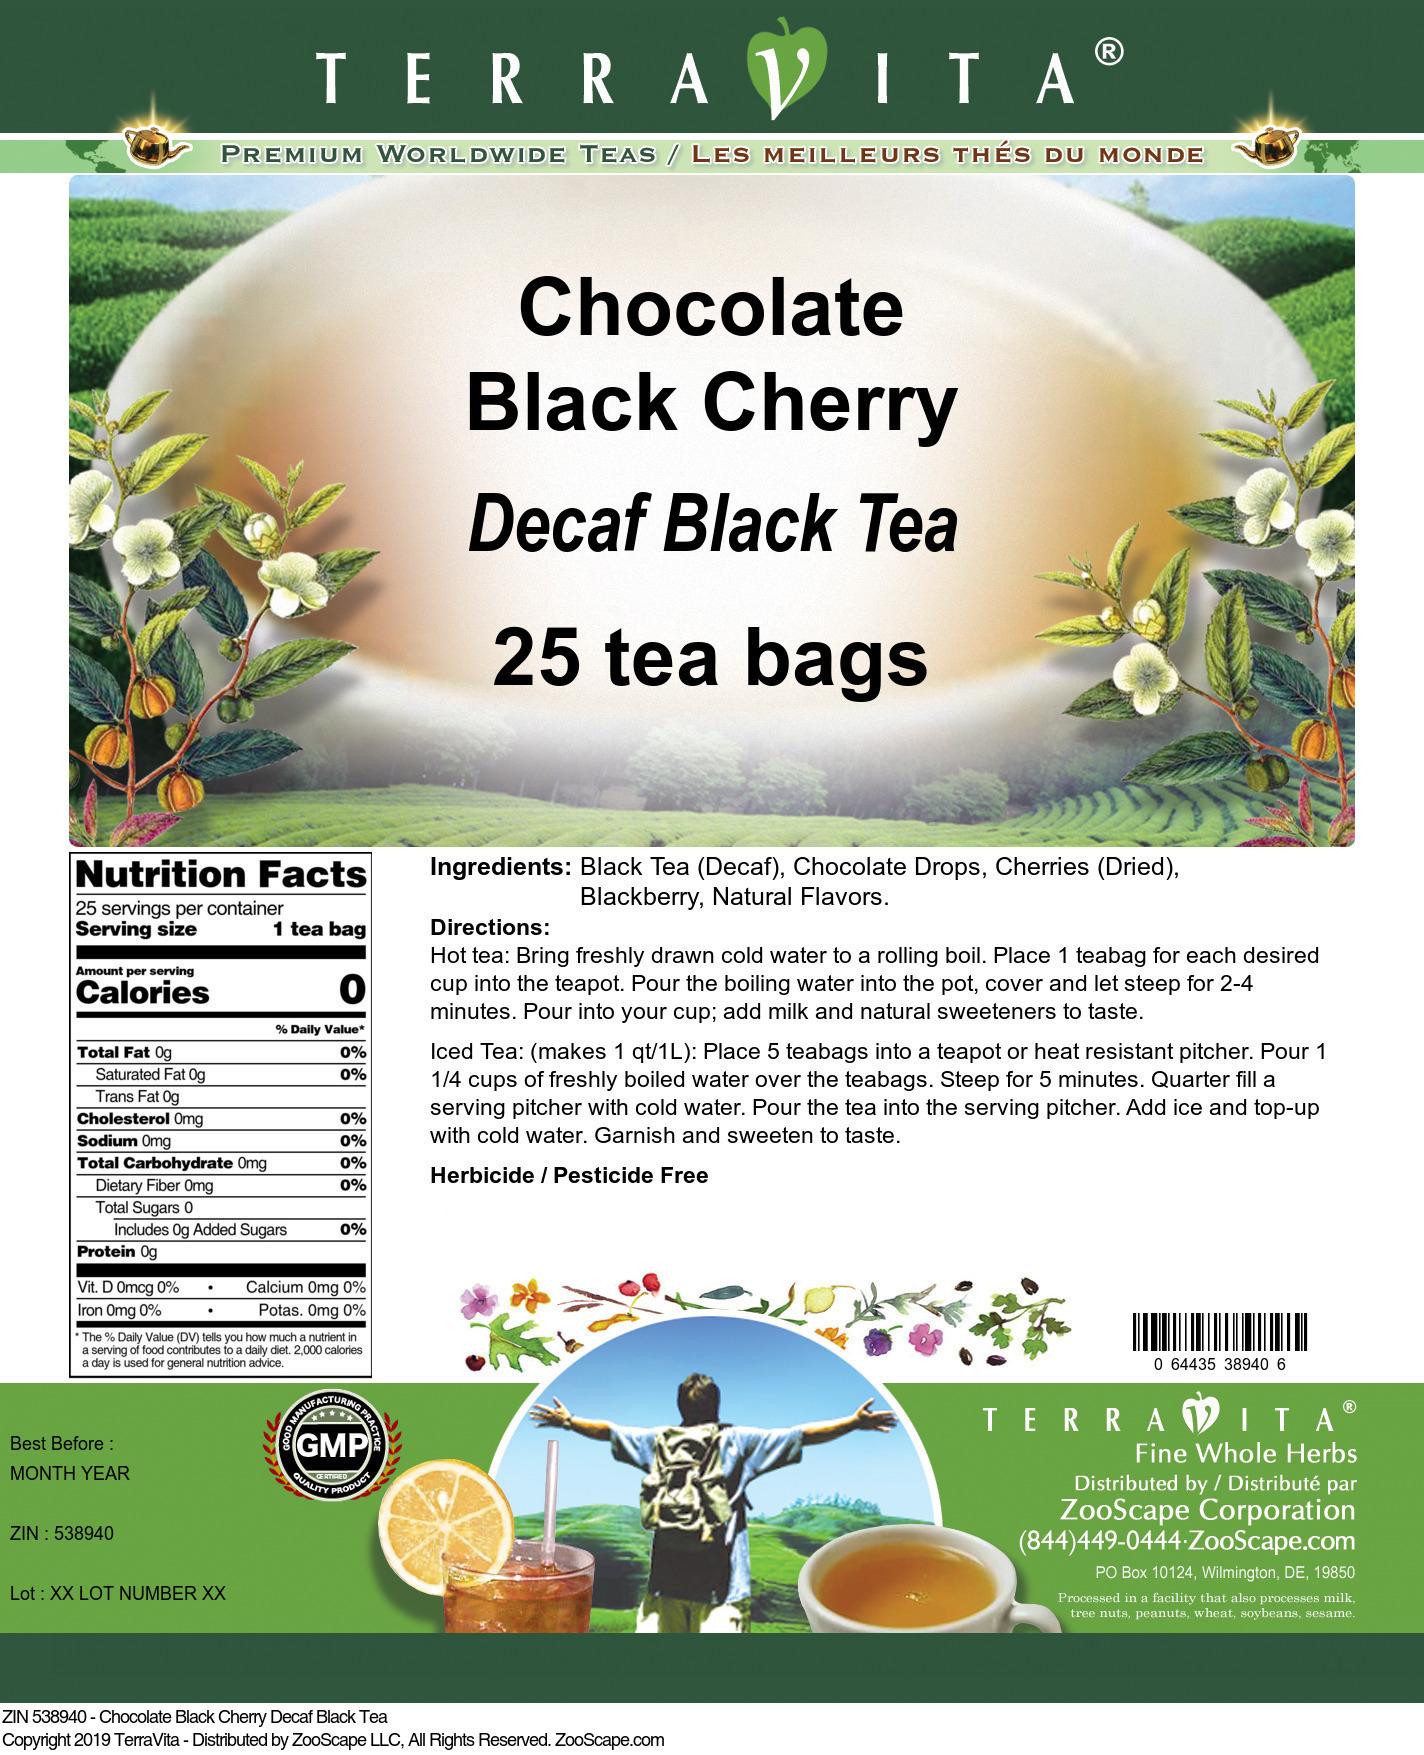 Chocolate Black Cherry Decaf Black Tea